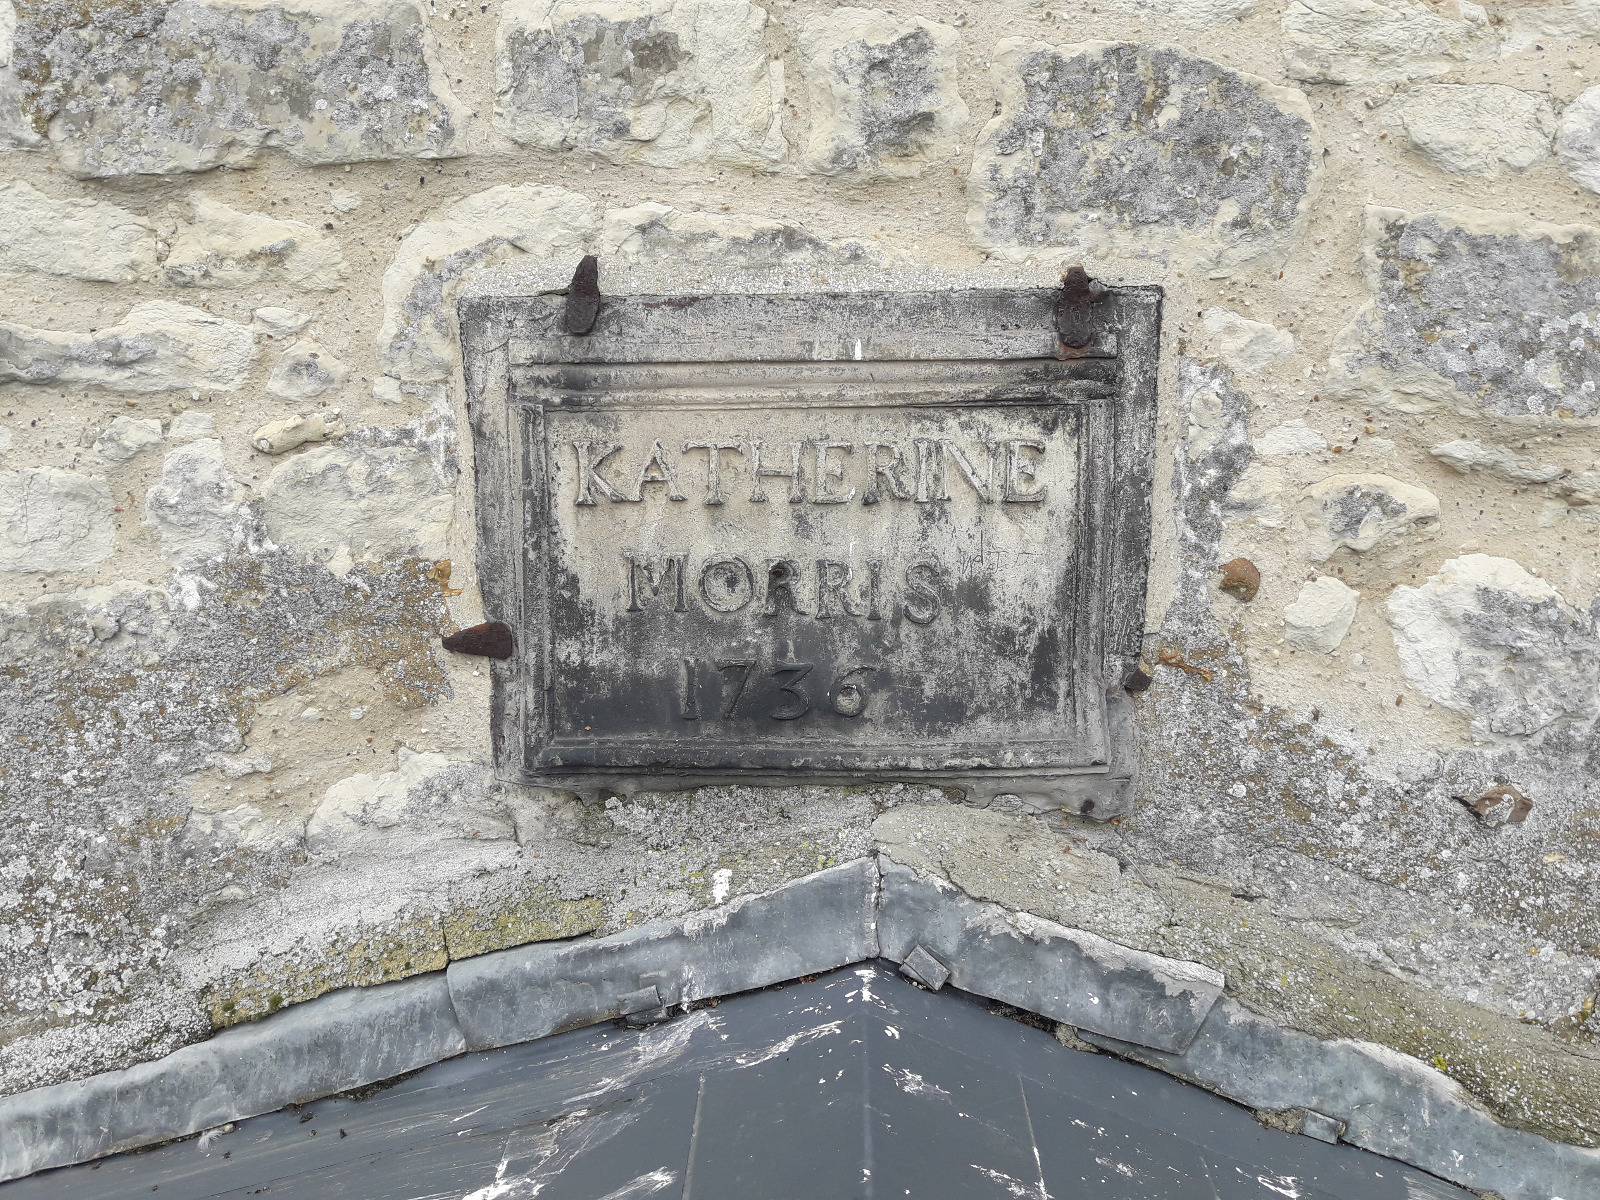 Katherine Morris plaque